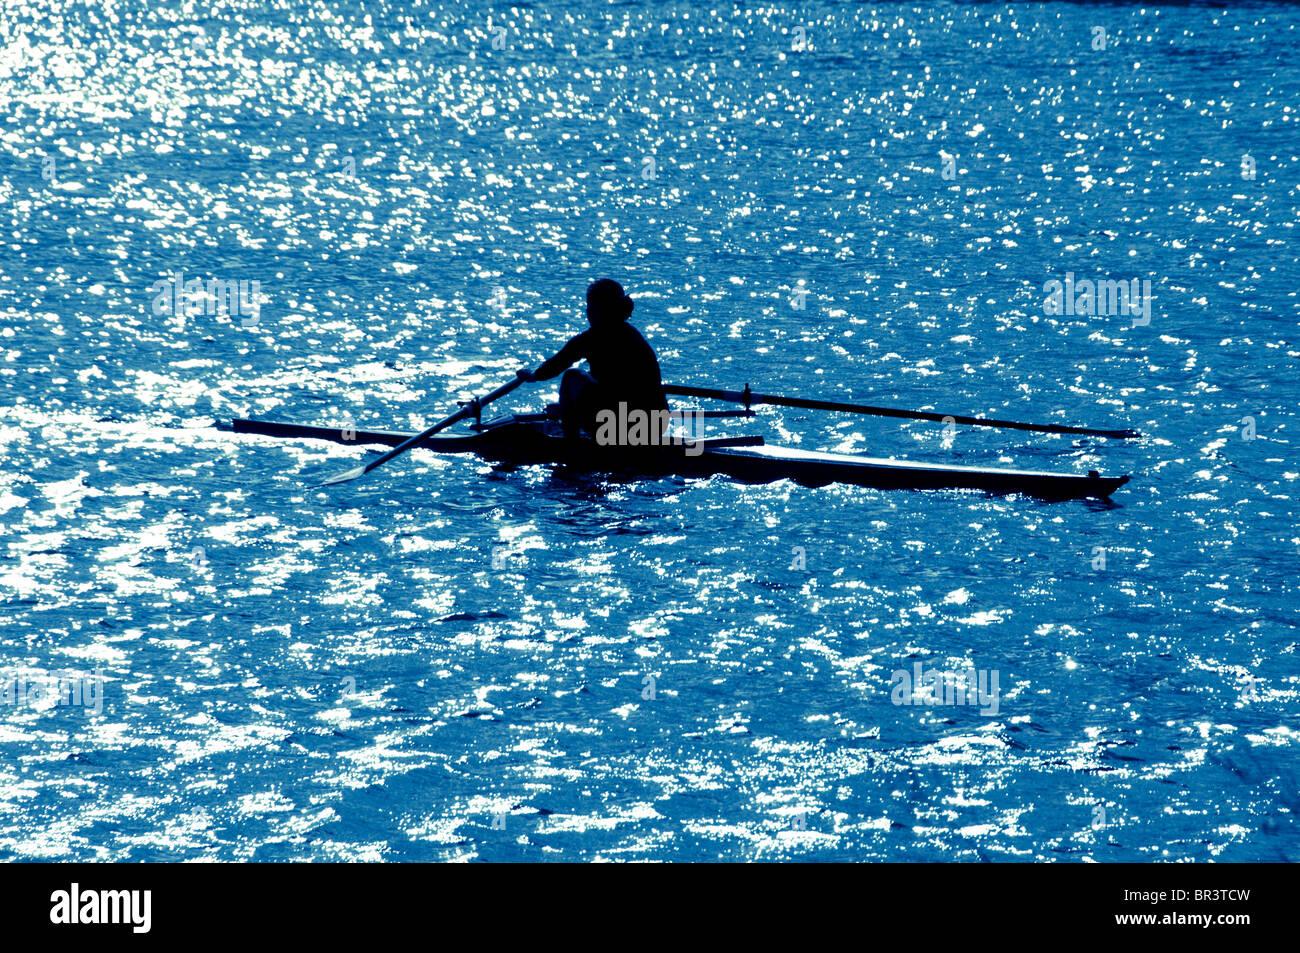 athlete rowing - Stock Image